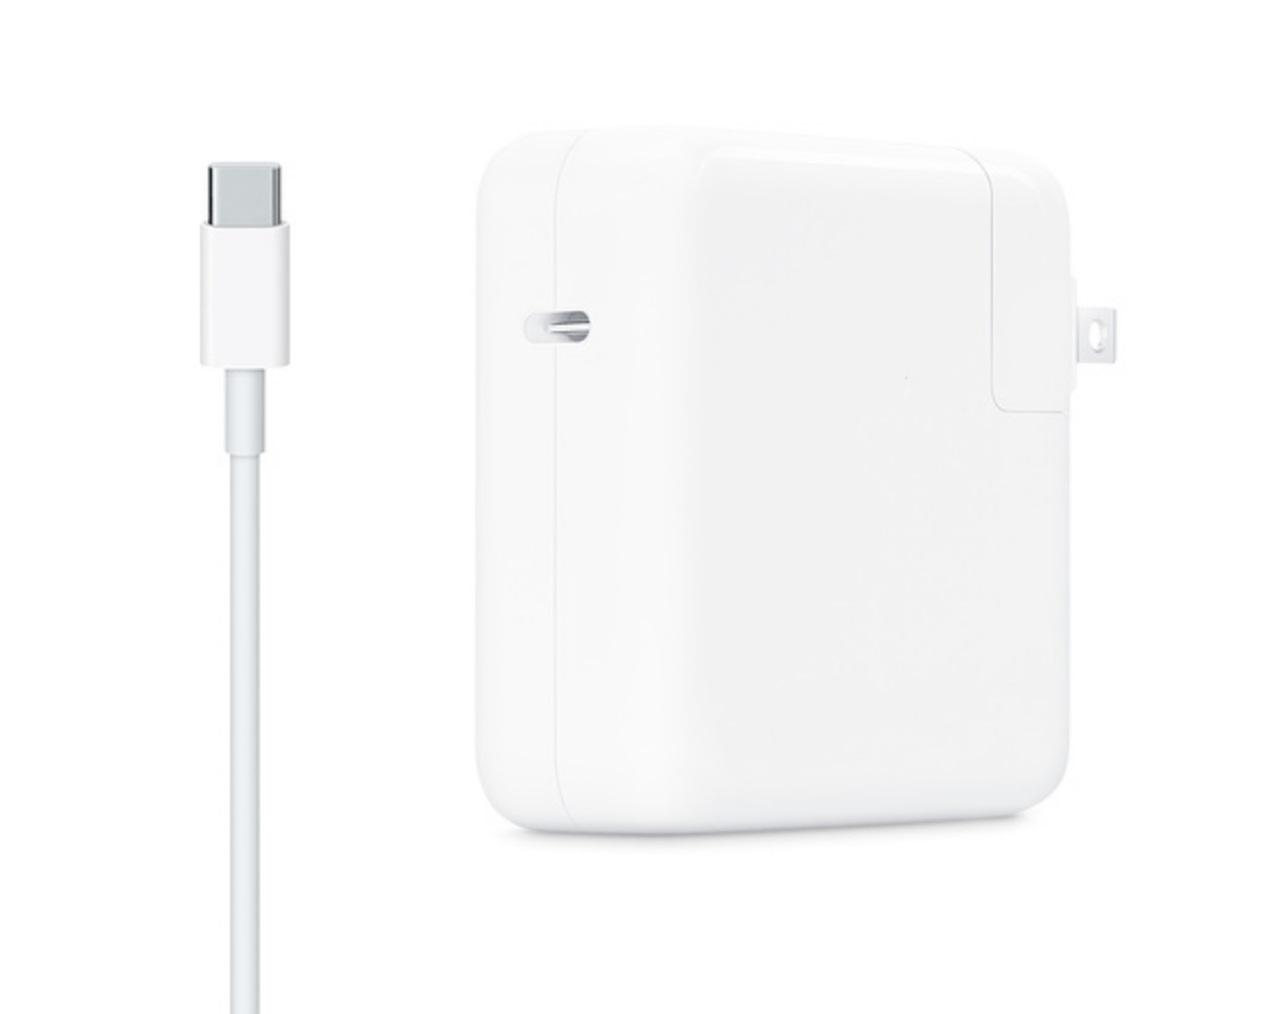 Adapter Nguồn Sạc 61W Cáp USB-C 2M Dành Cho MacBook, MacBook Pro, MacBook Air, Sạc Nhanh iPad, iPhone